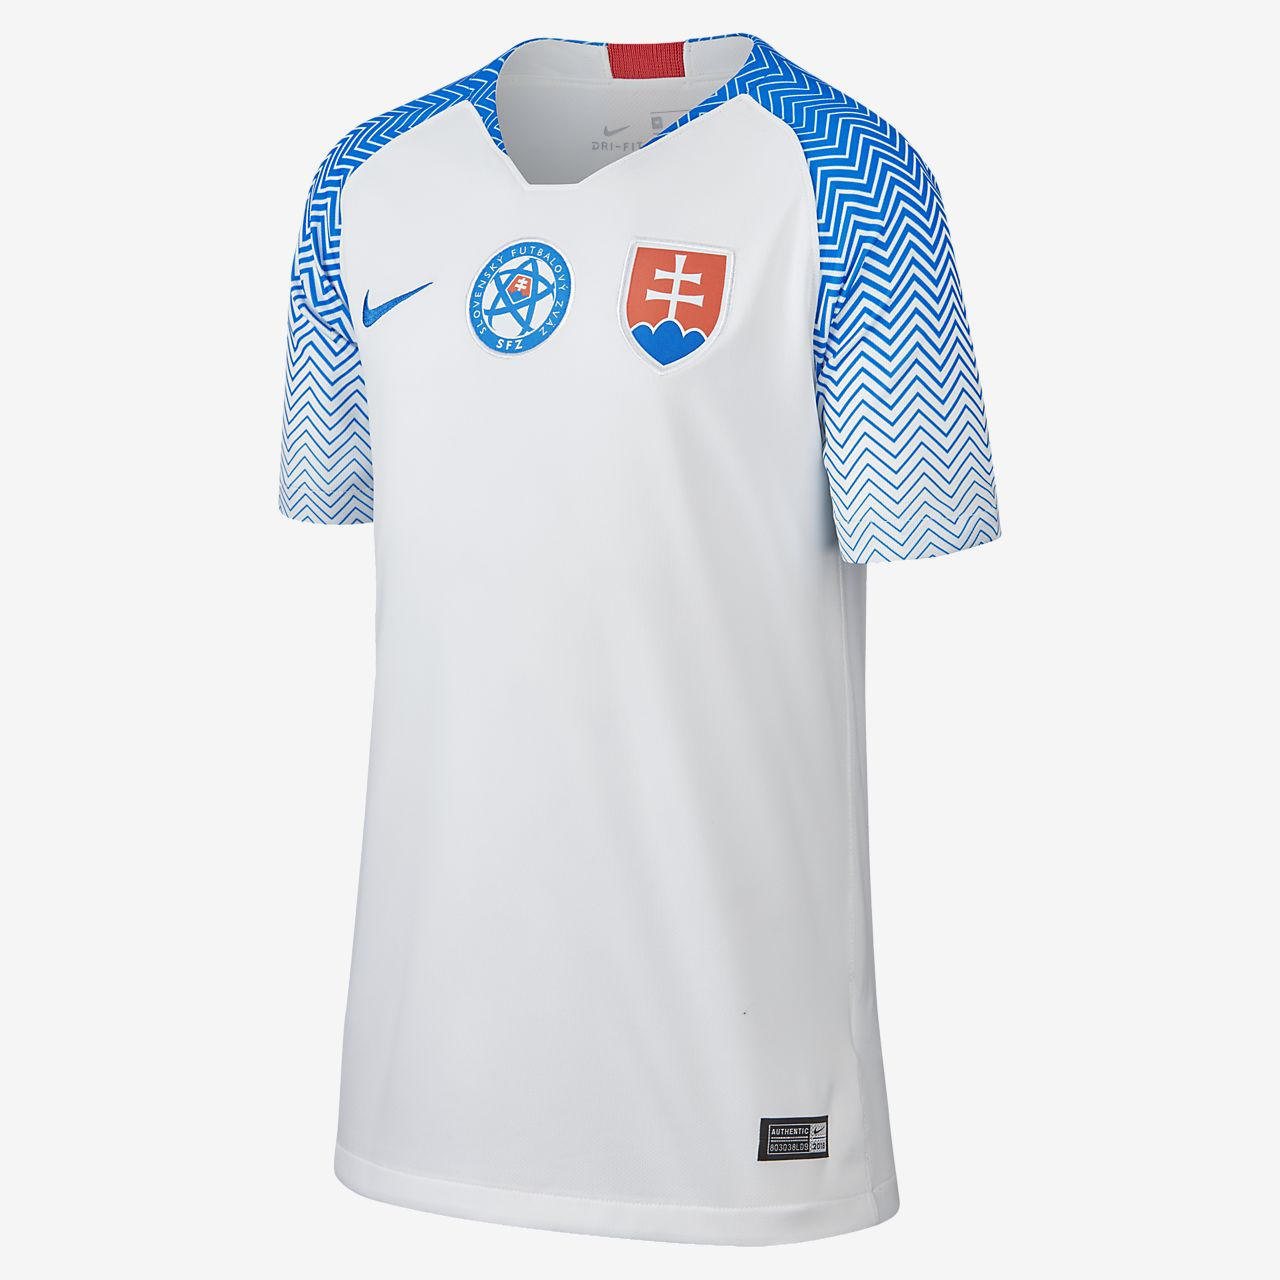 2018 Slovakia Stadium Home-fodboldtrøje til store børn